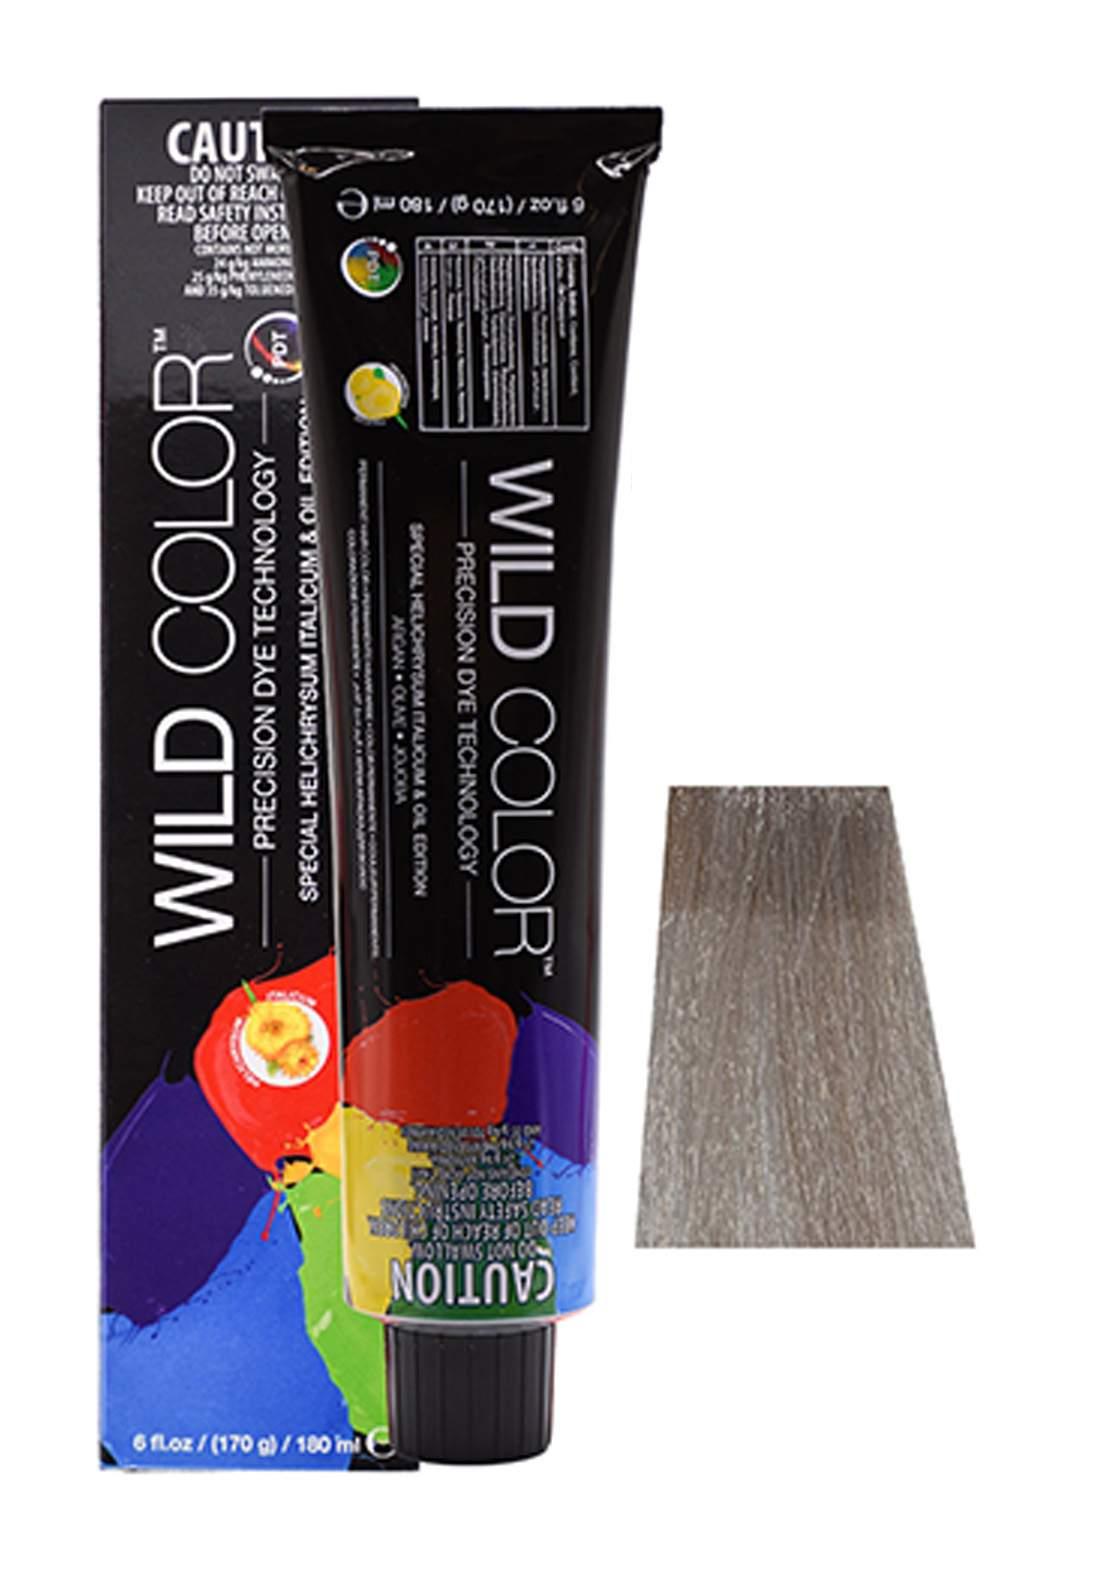 Wild Color Hair Color Cream 8.1 8A - Ligh Ash Blond صبغة شعر